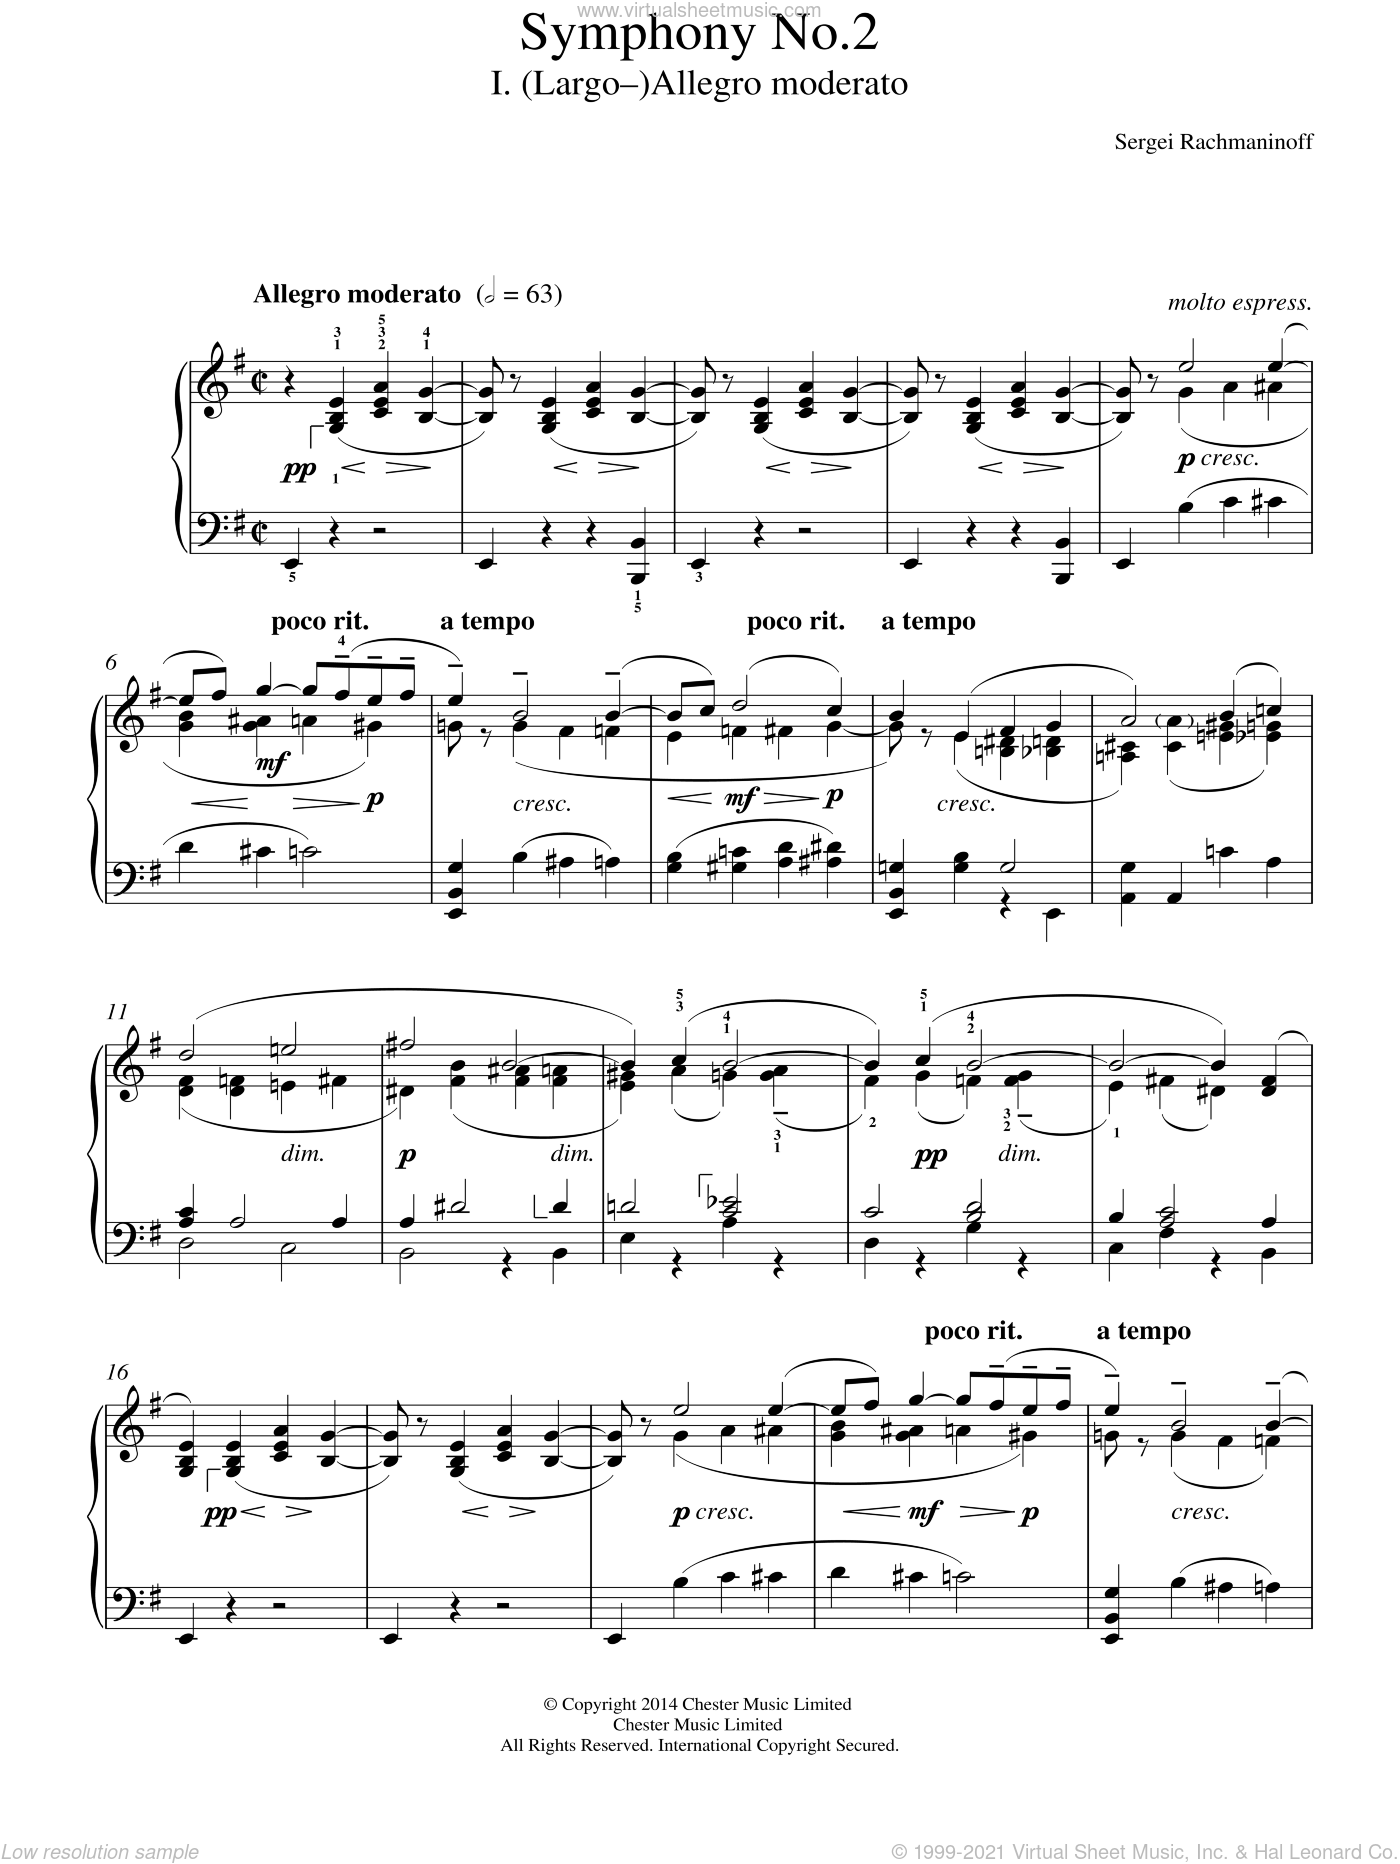 Symphony No. 2, Movement 2